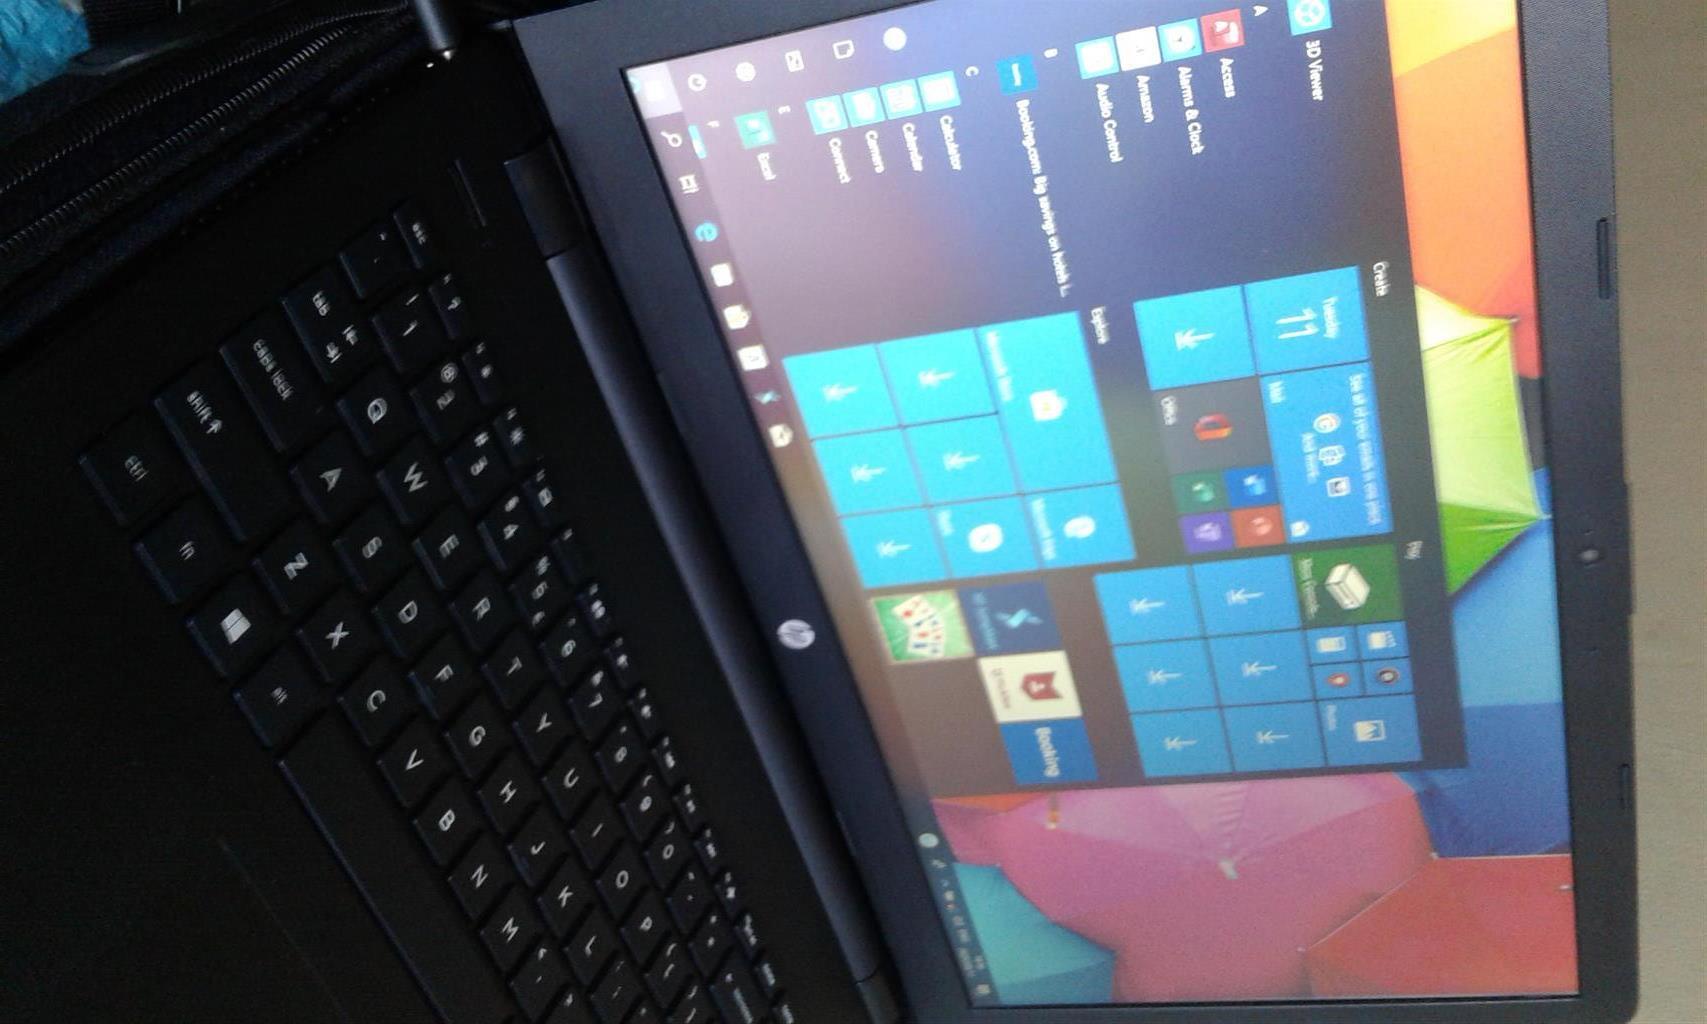 "HP 15 Intel i3-5005U Windows 10 Home 15.6"" Notebook, Jet Black, 4Gig Ram, 2Ghz, 1T HDD."